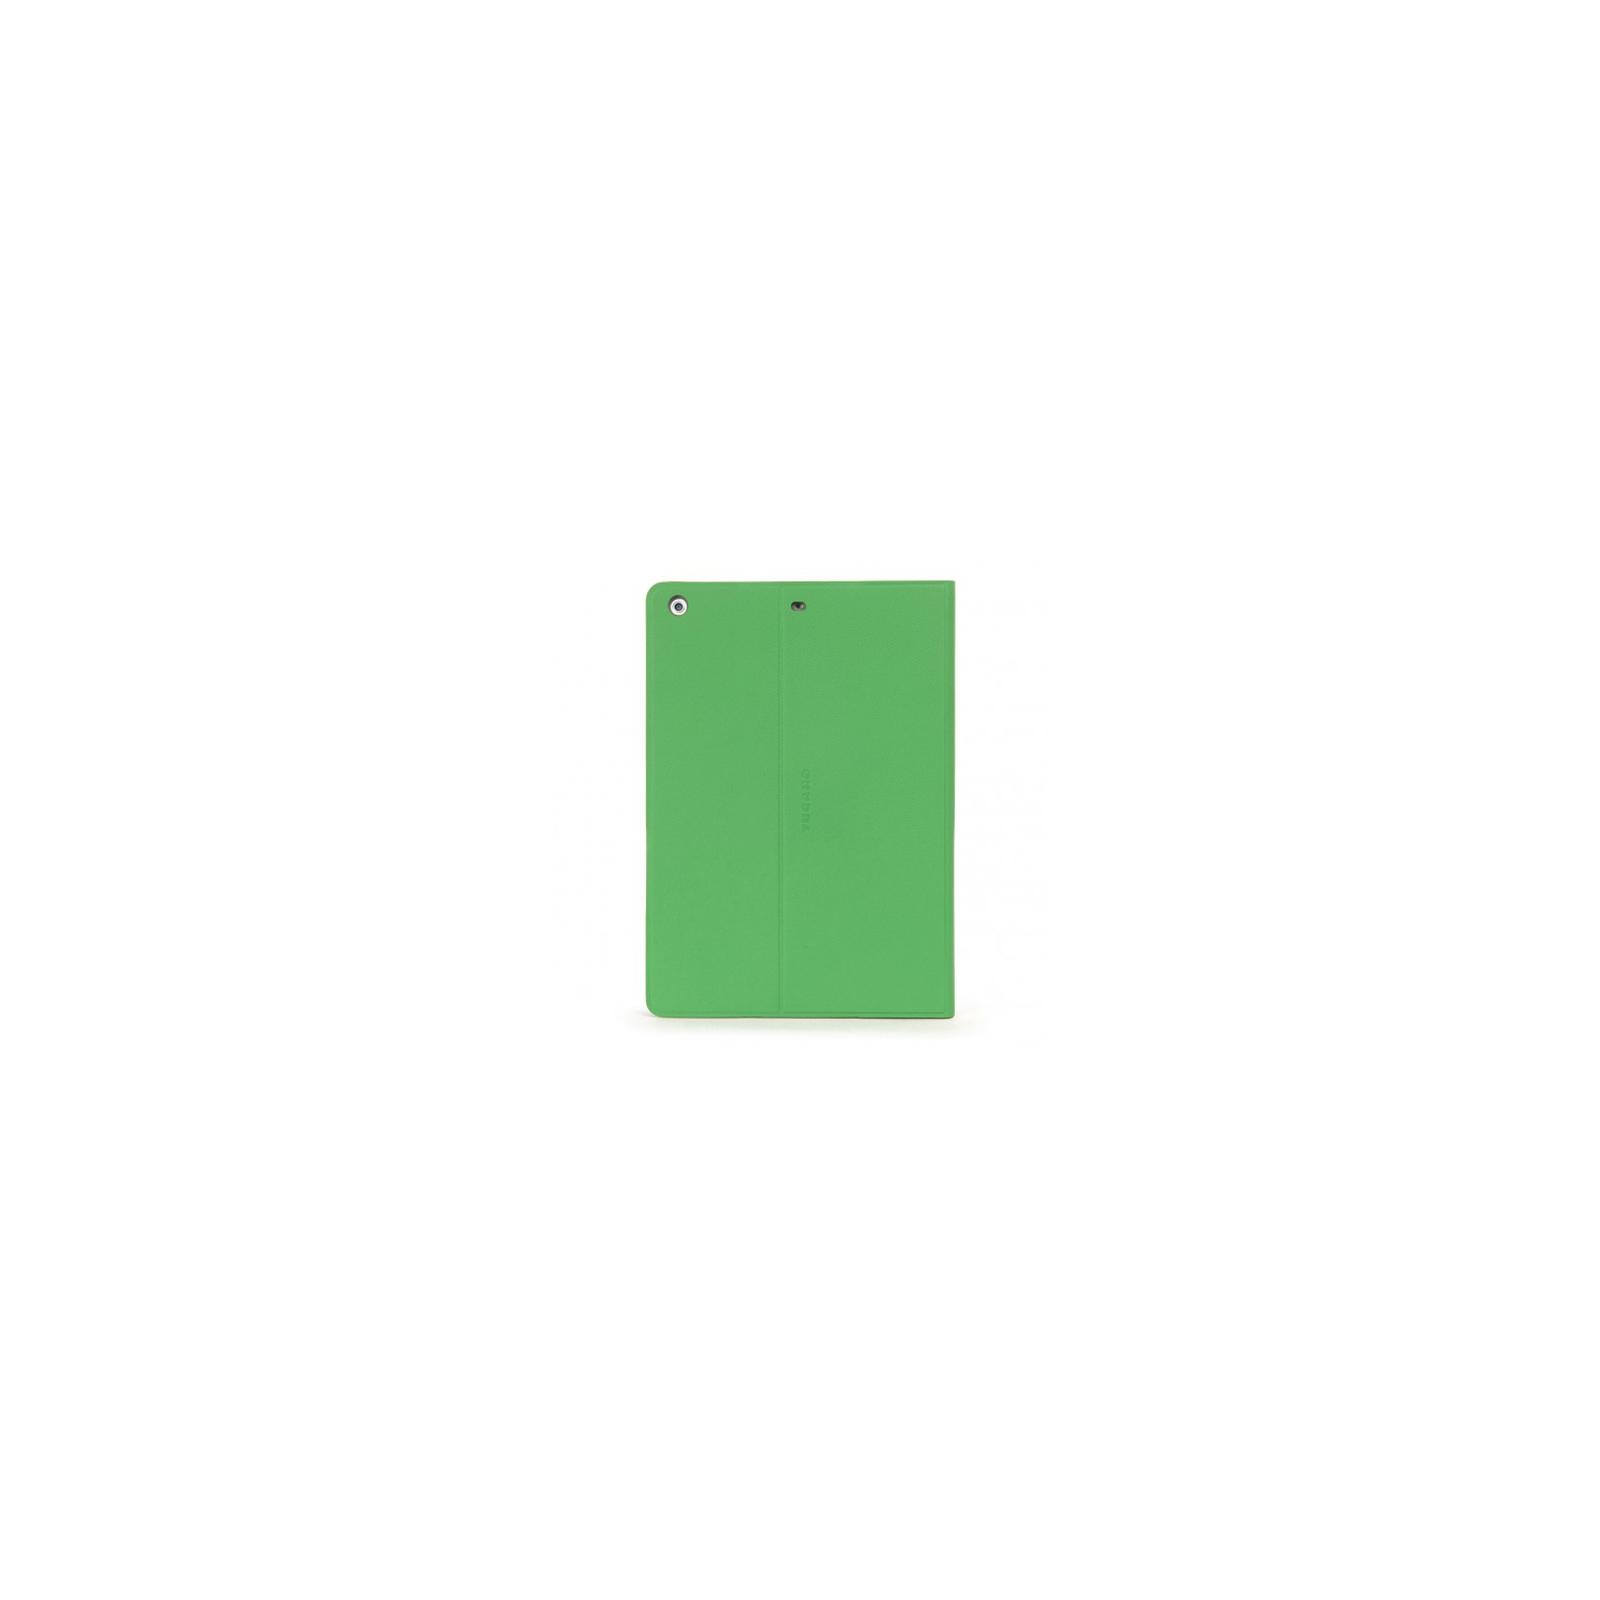 Чехол для планшета Tucano iPad Air Angolo Green (IPD5AN-V) изображение 4